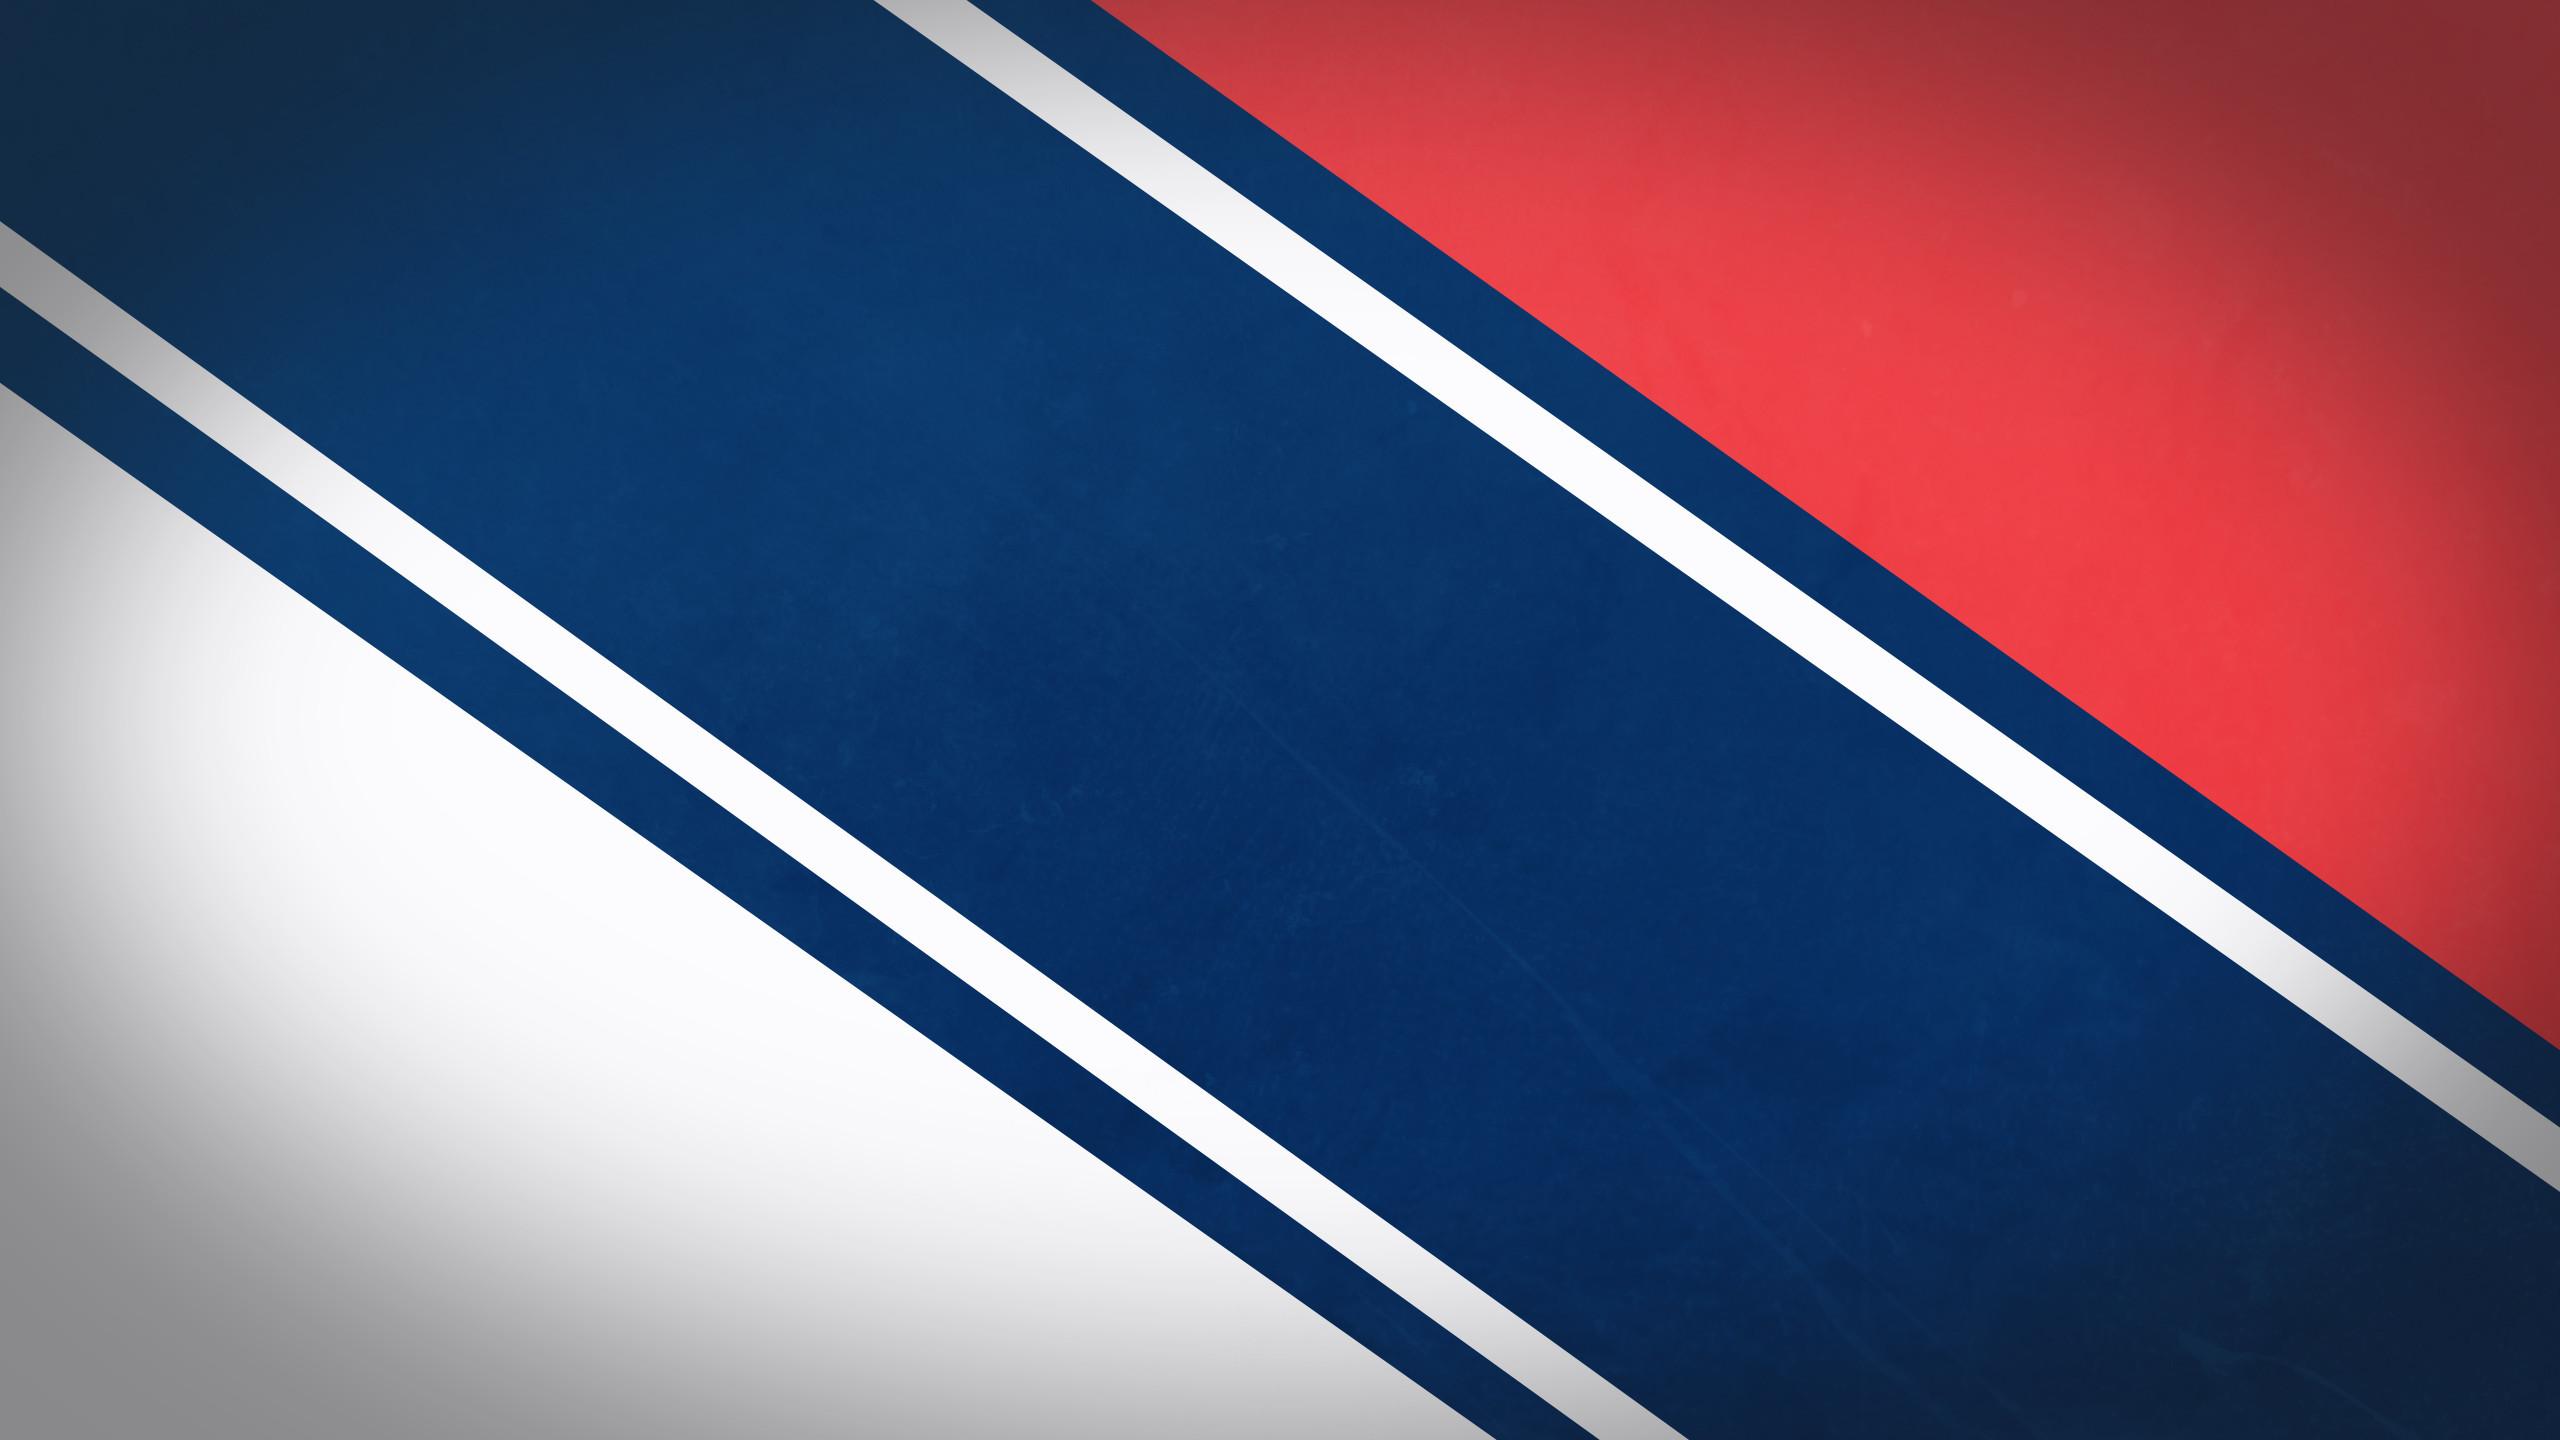 Res: 2560x1440, New York Rangers Wallpaper